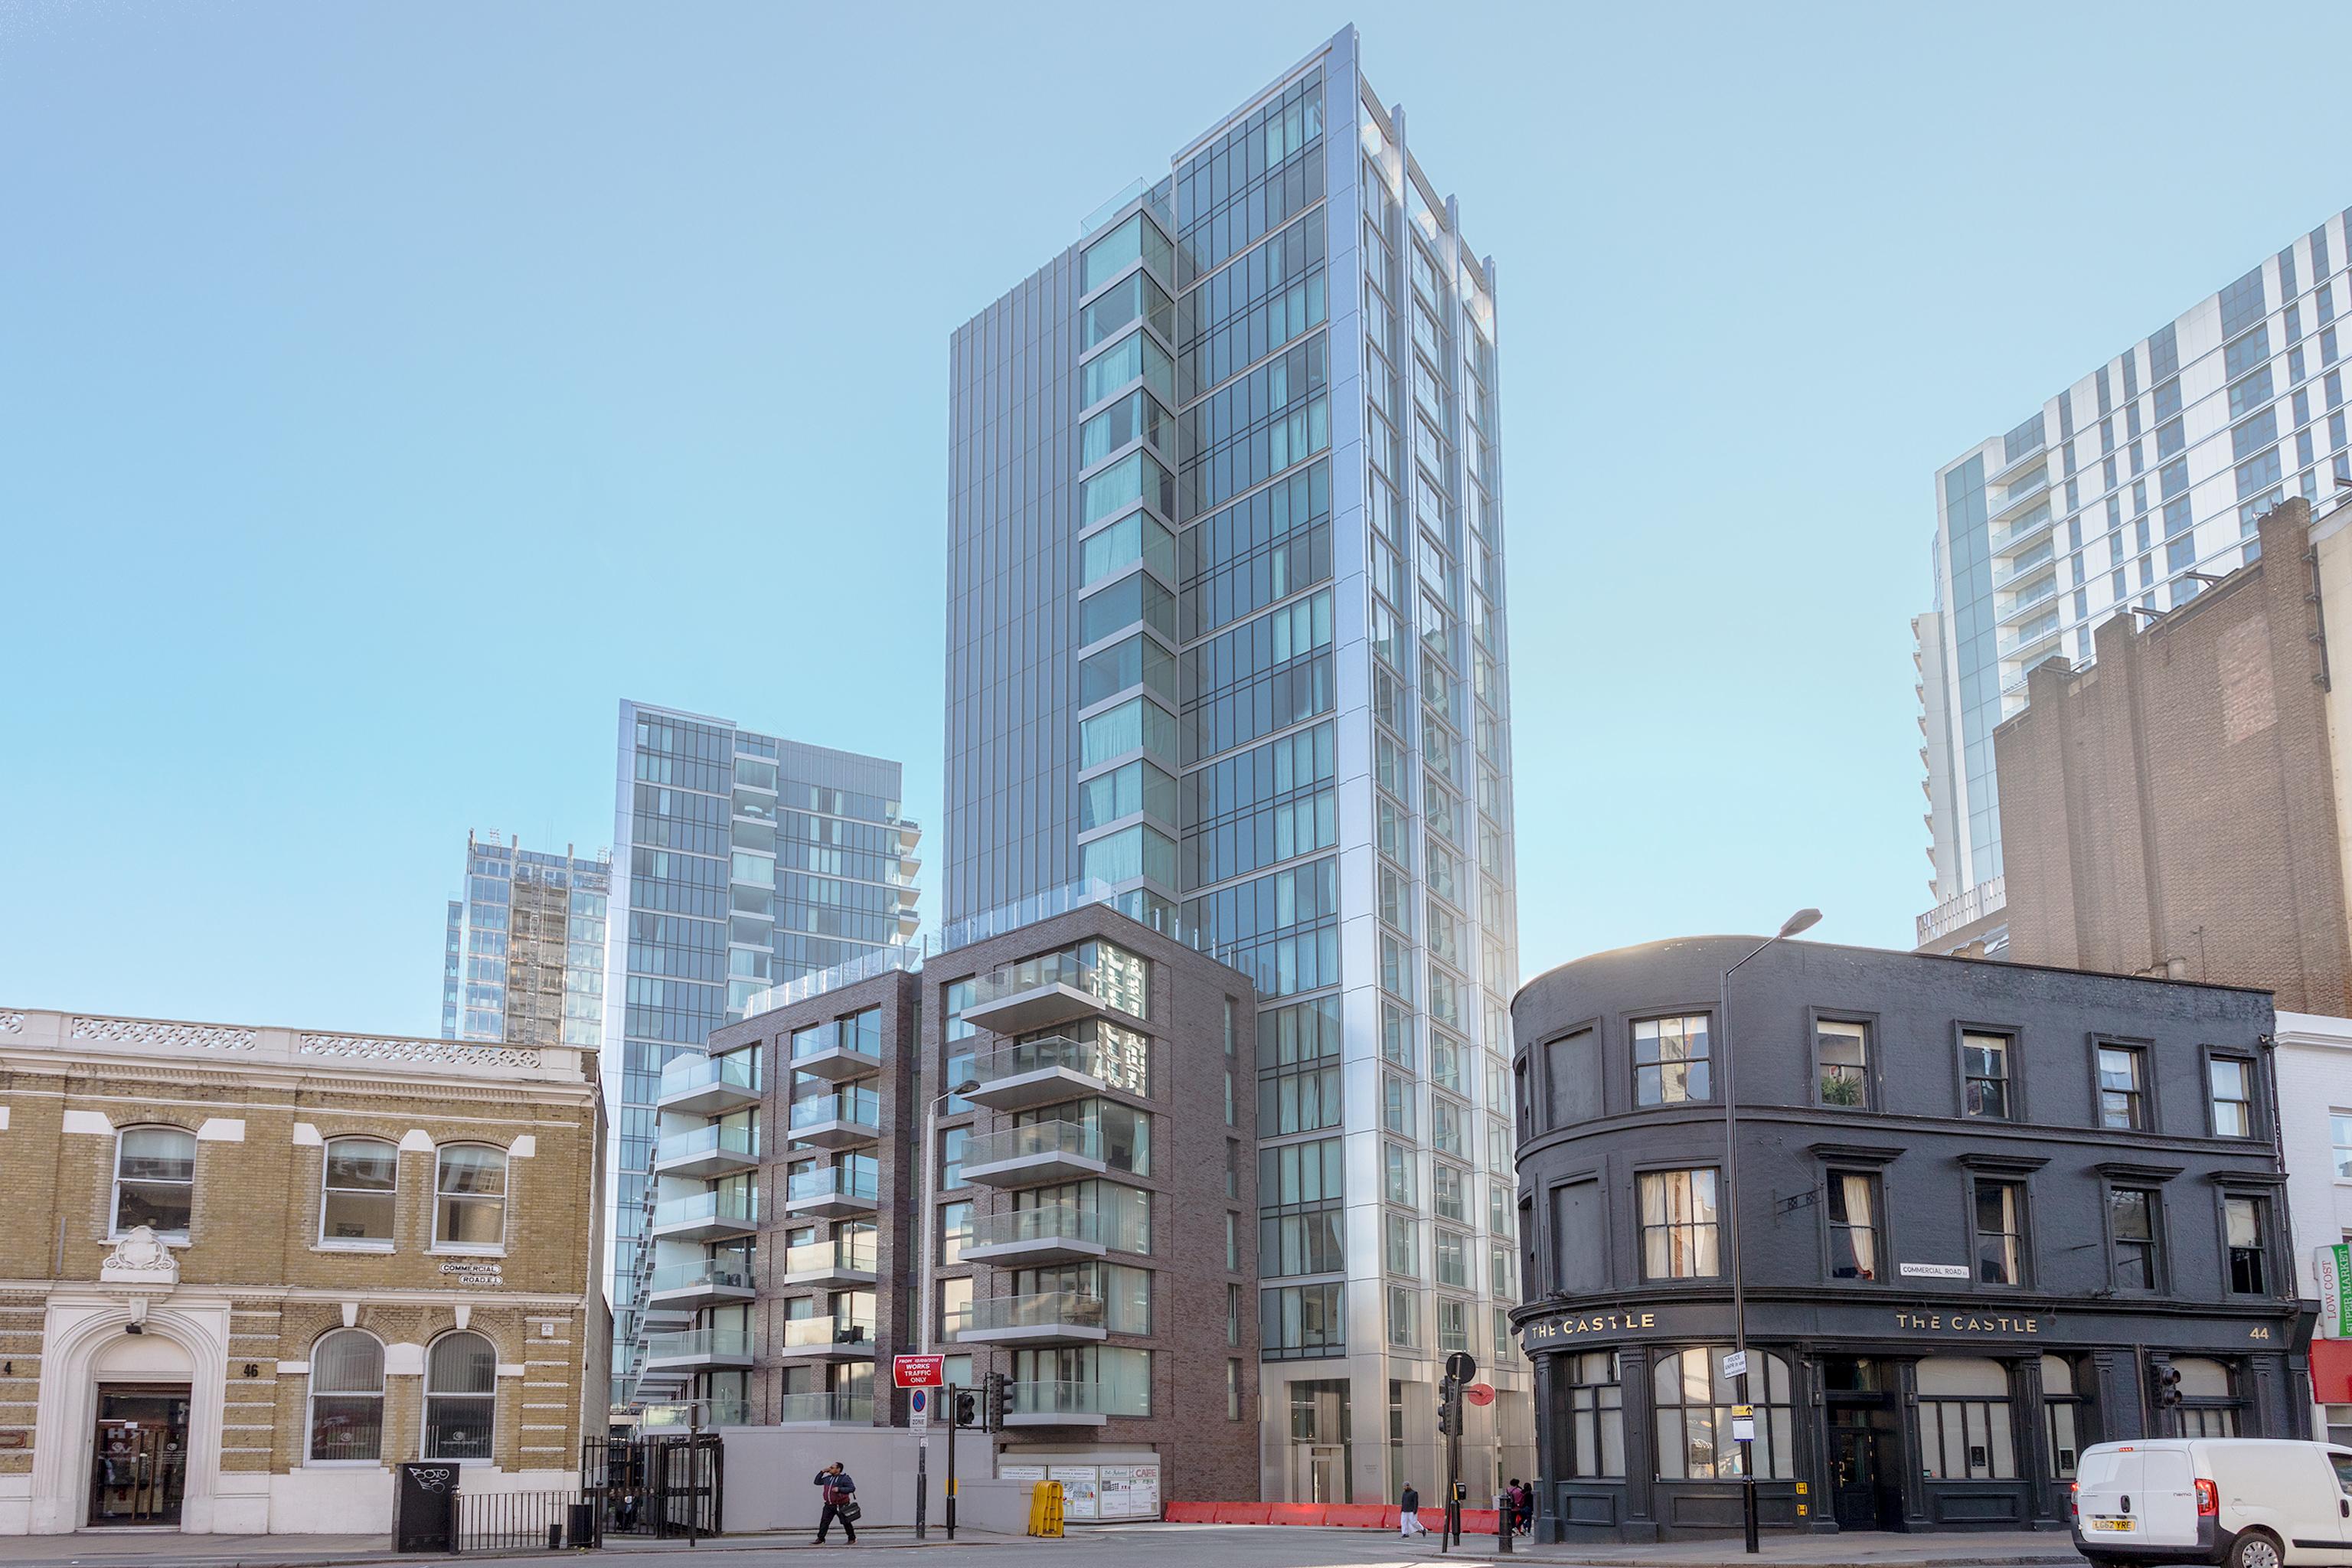 Apartment 408  meranti house  84  alie street  london e1 8qd 030